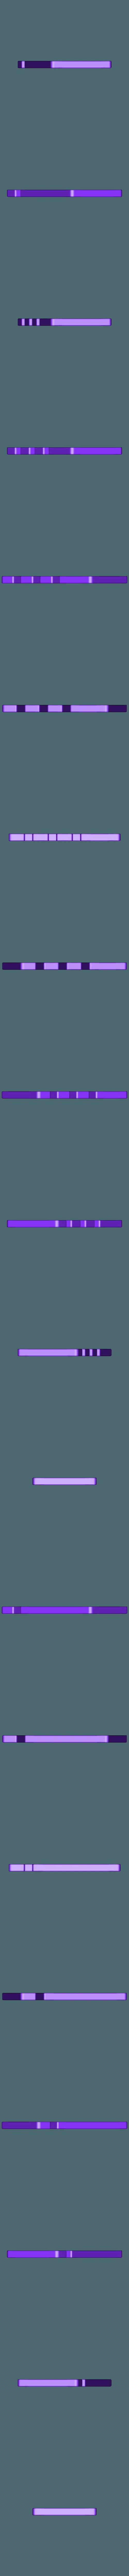 part1x1.stl Download free STL file The lattice puzzle • 3D printing object, dancingchicken